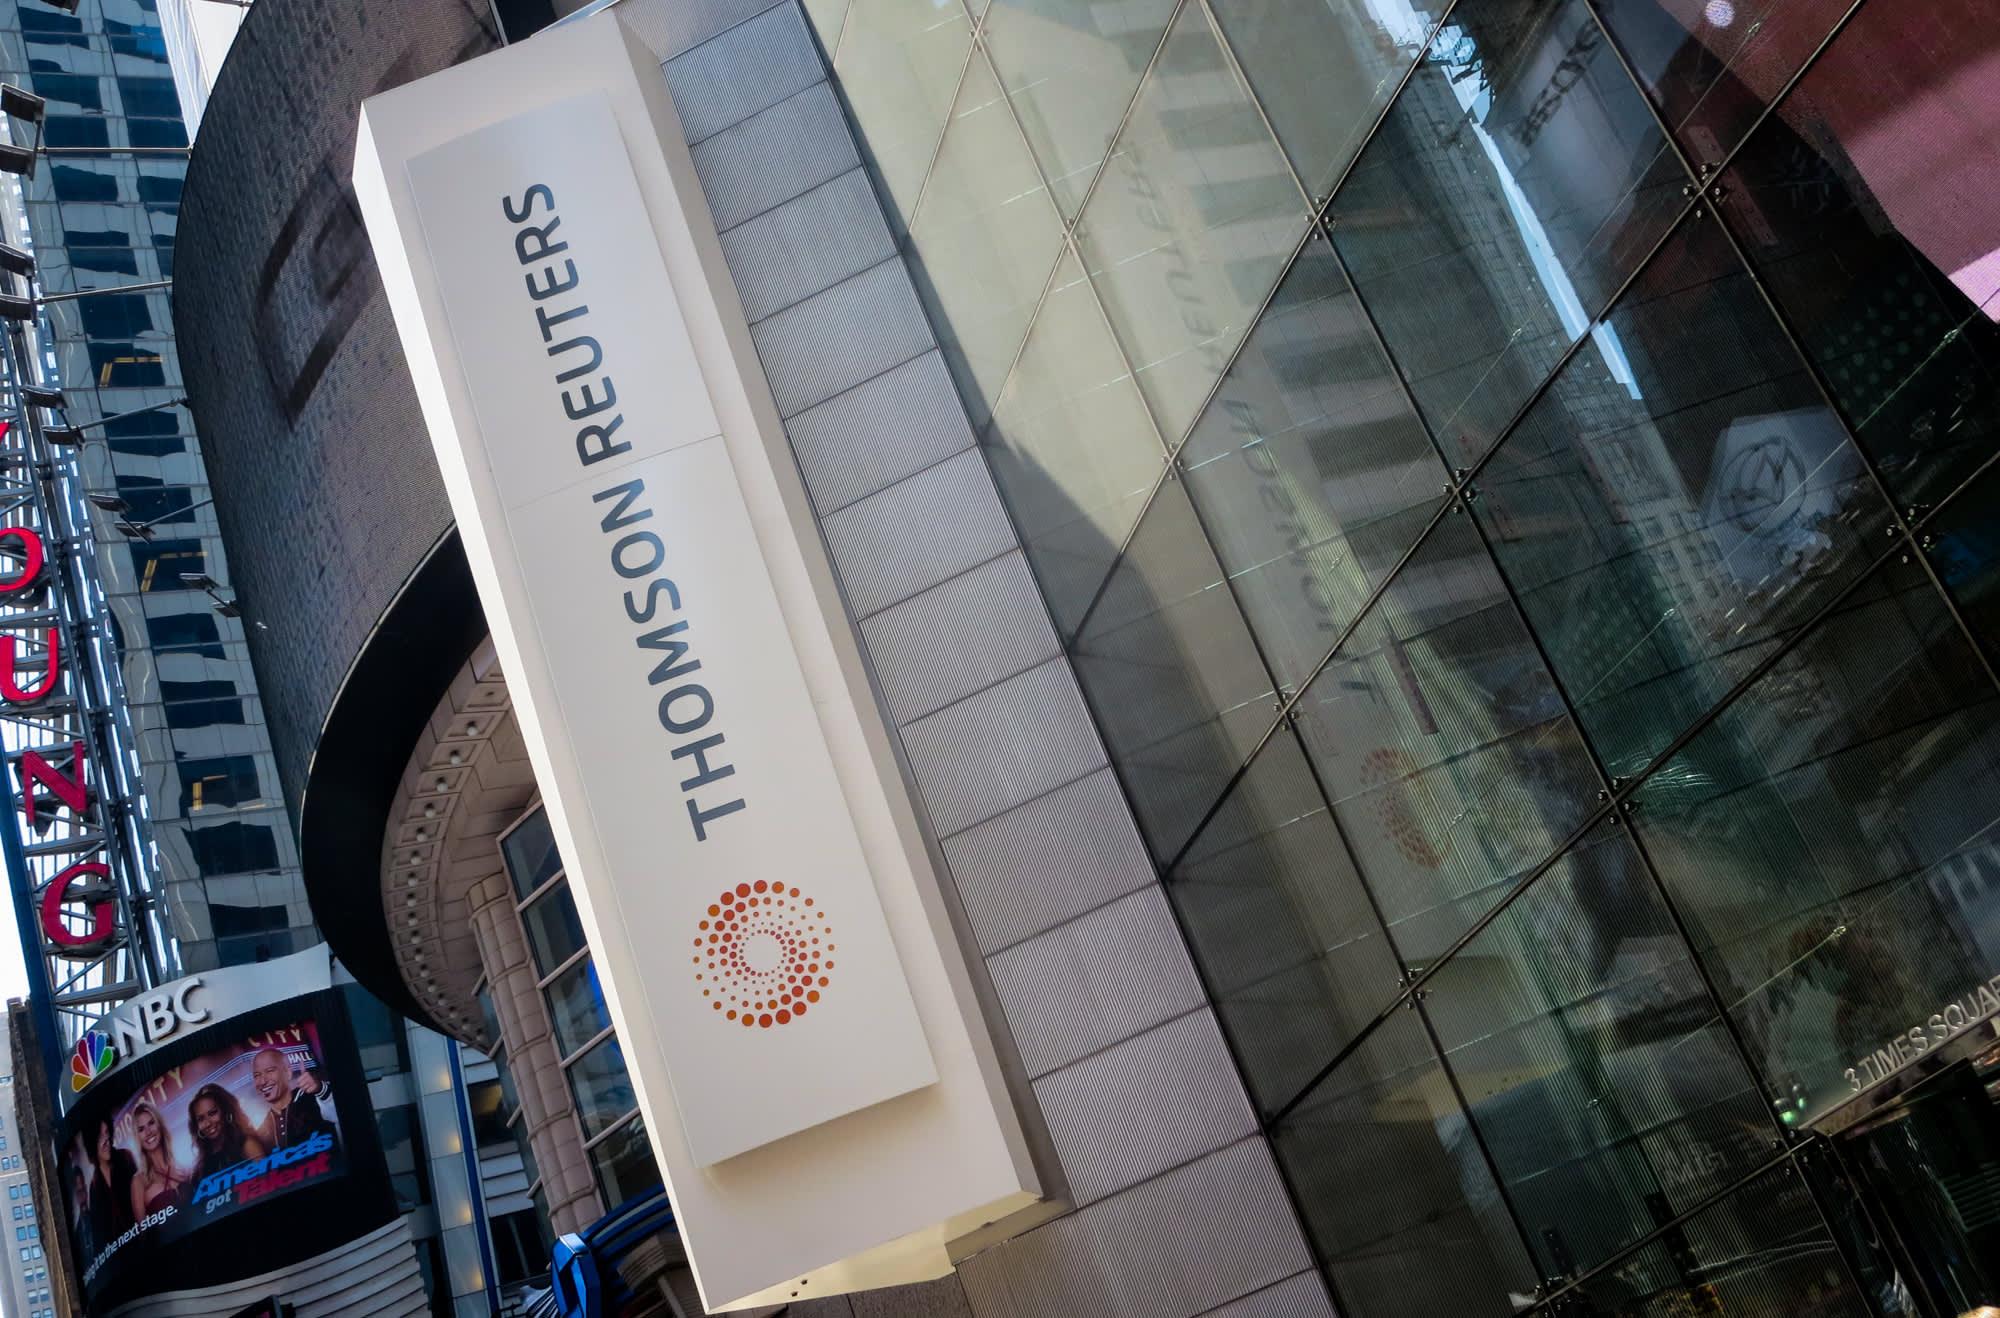 Thomson Reuters Surges After 9 Billion Stock Buyback Announcement